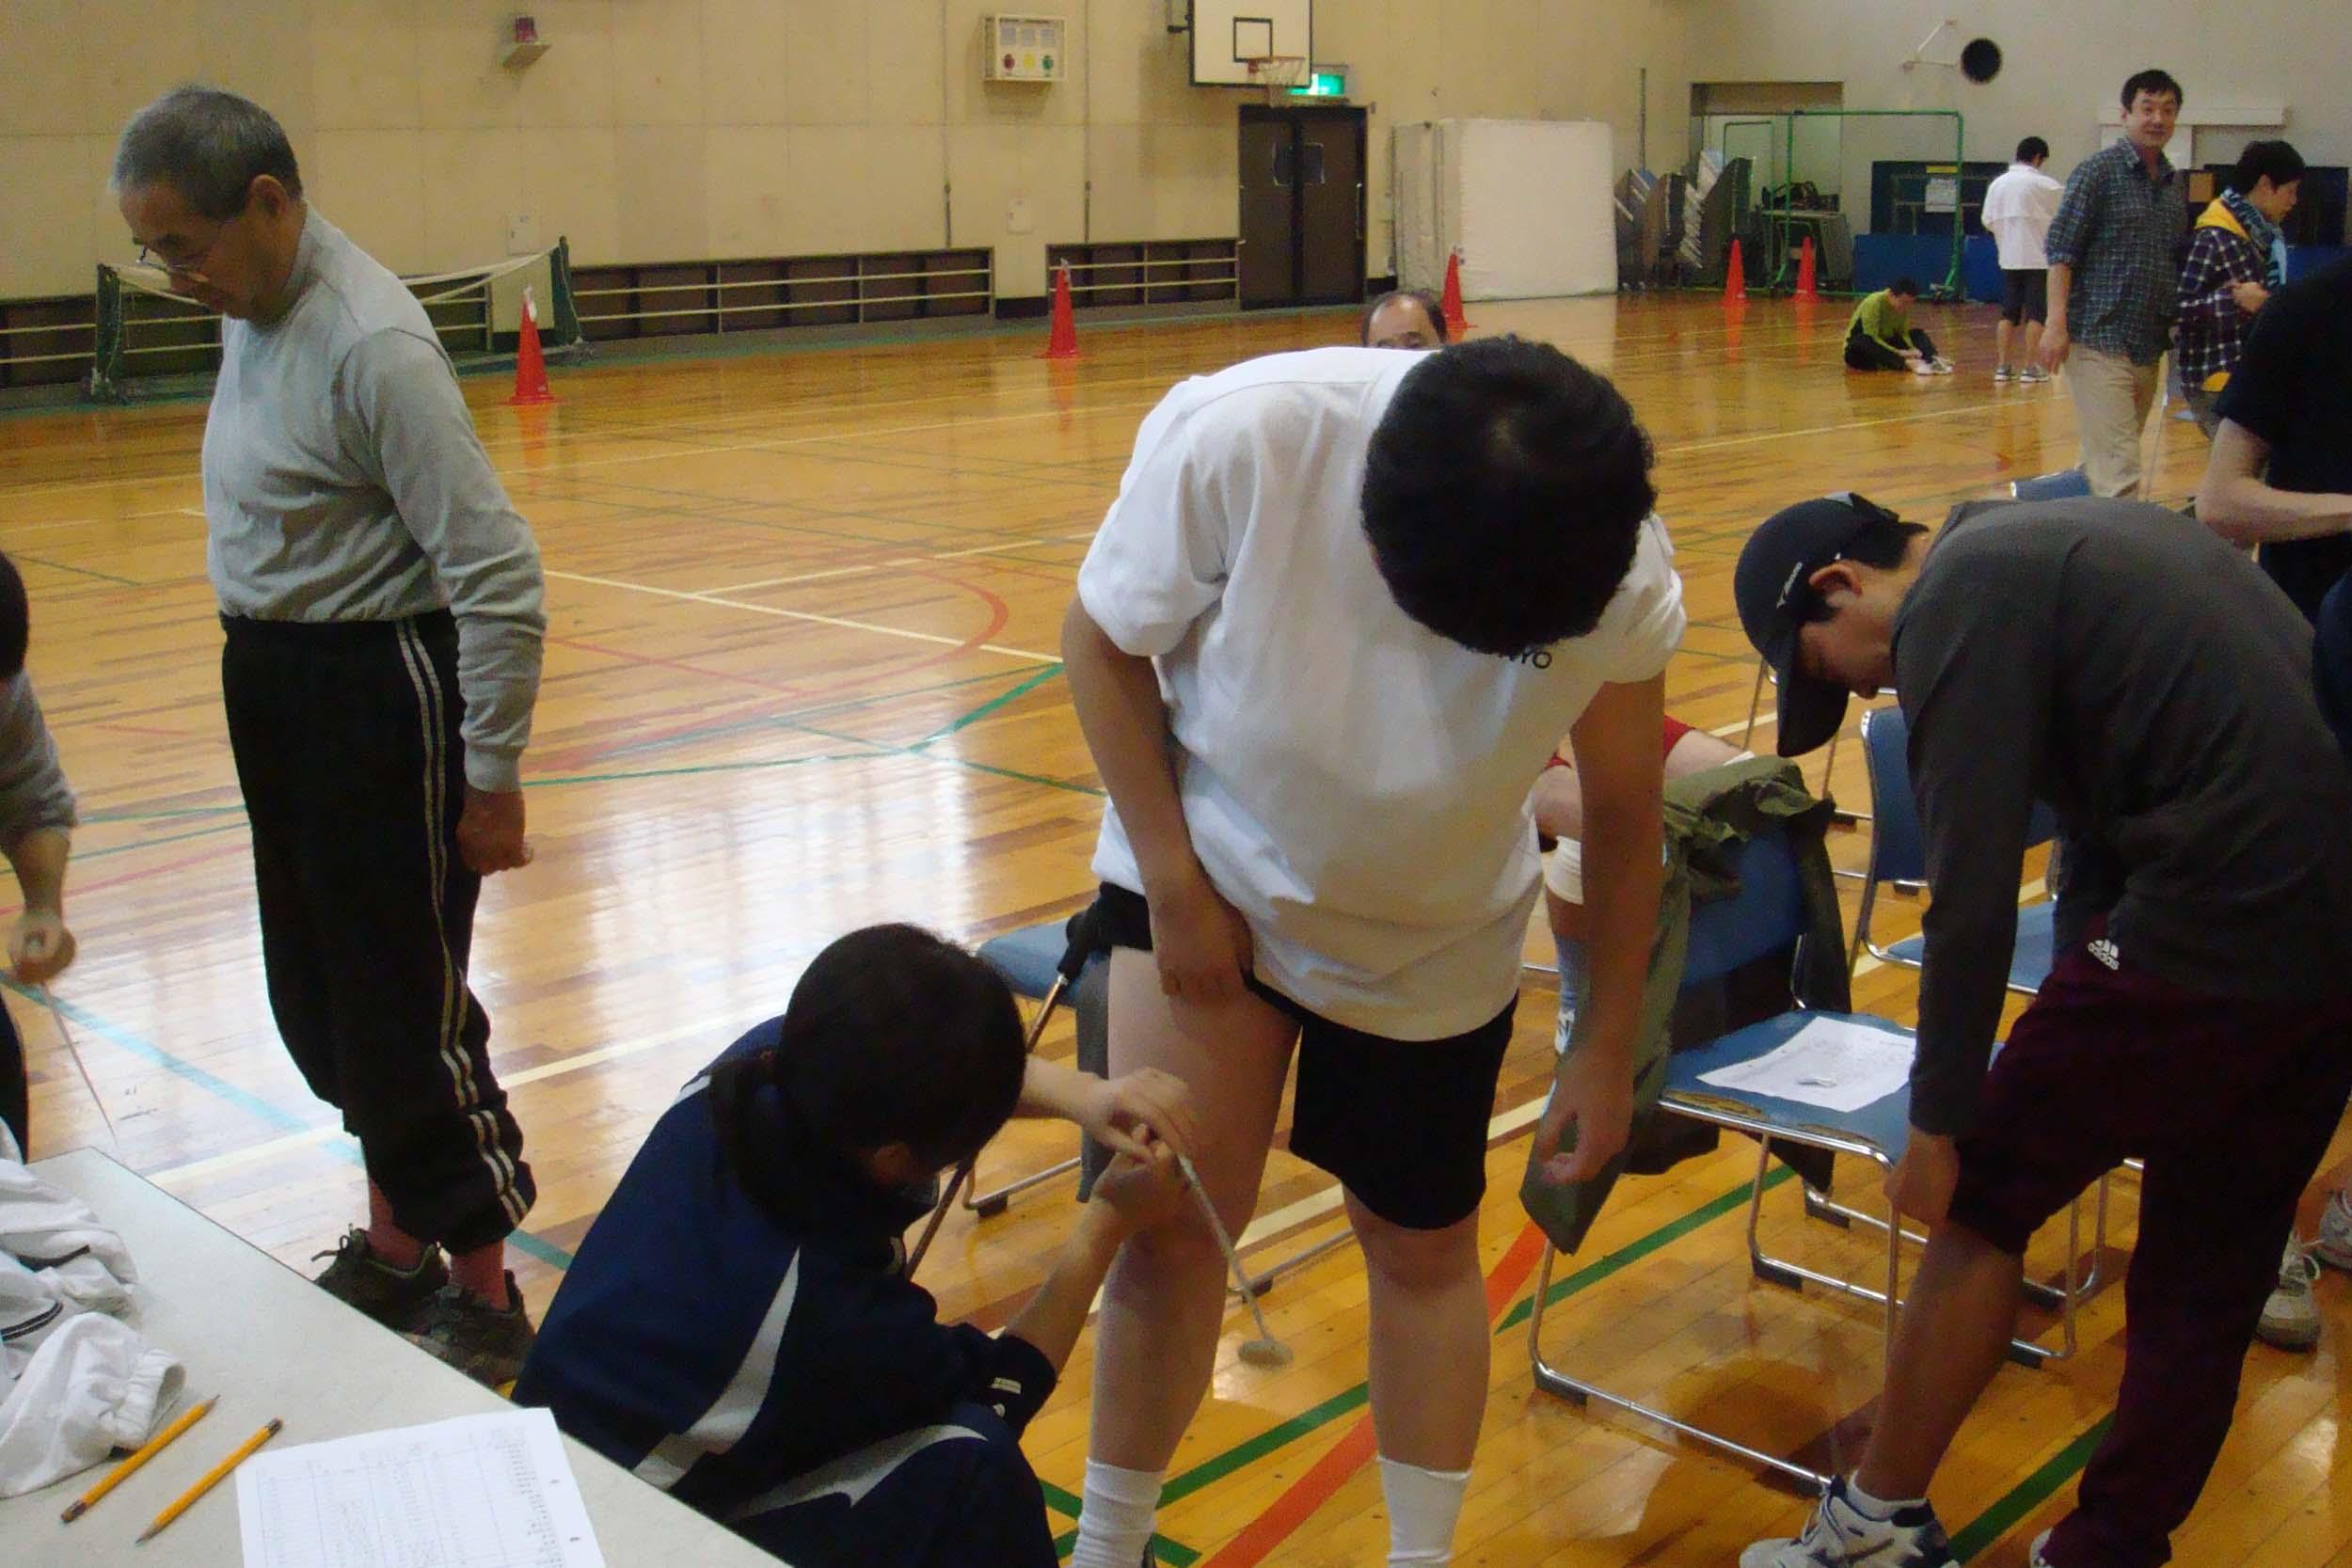 tairyokusokutei - 体力測定より・・・体力チェックしましょう!